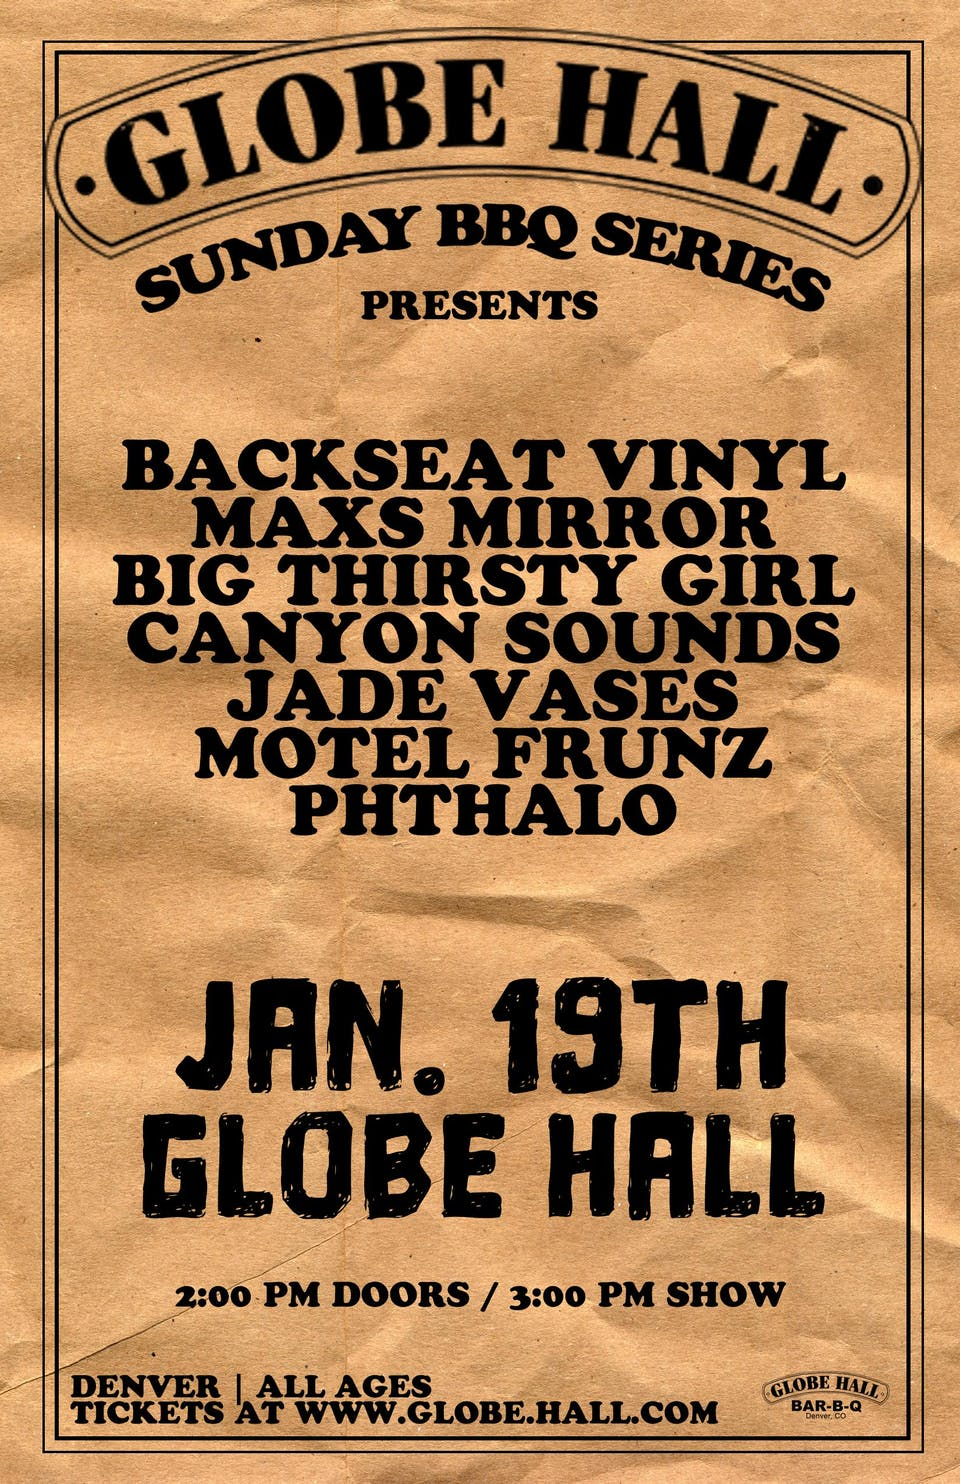 Globe Hall BBQ Series Presents  - Backseat Vinyl